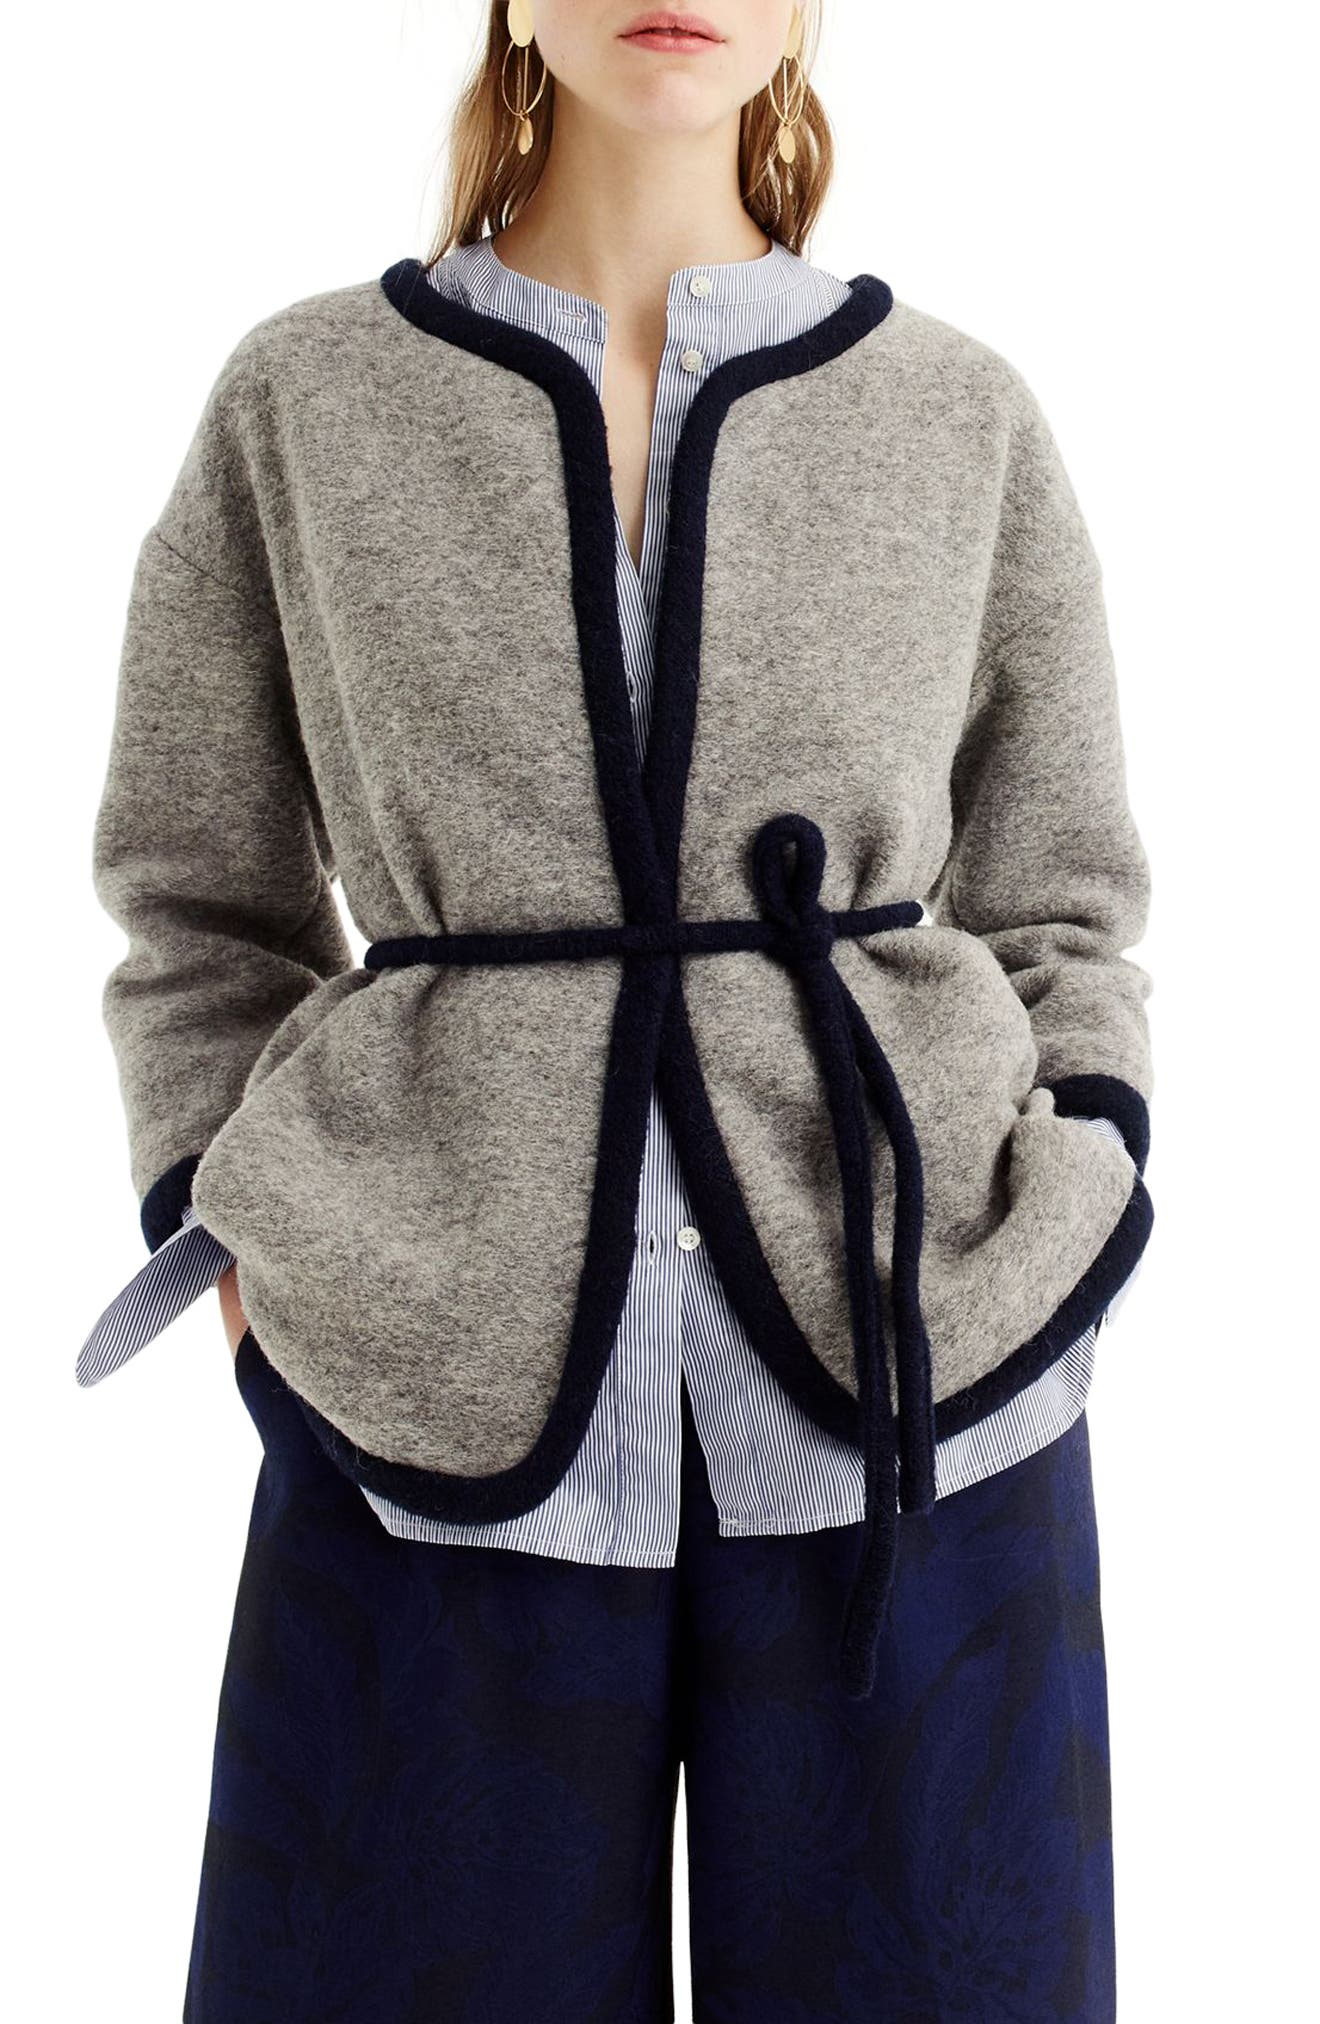 Branford Boiled Wool Blend Jacket,                         Main,                         color, Heather Graphite